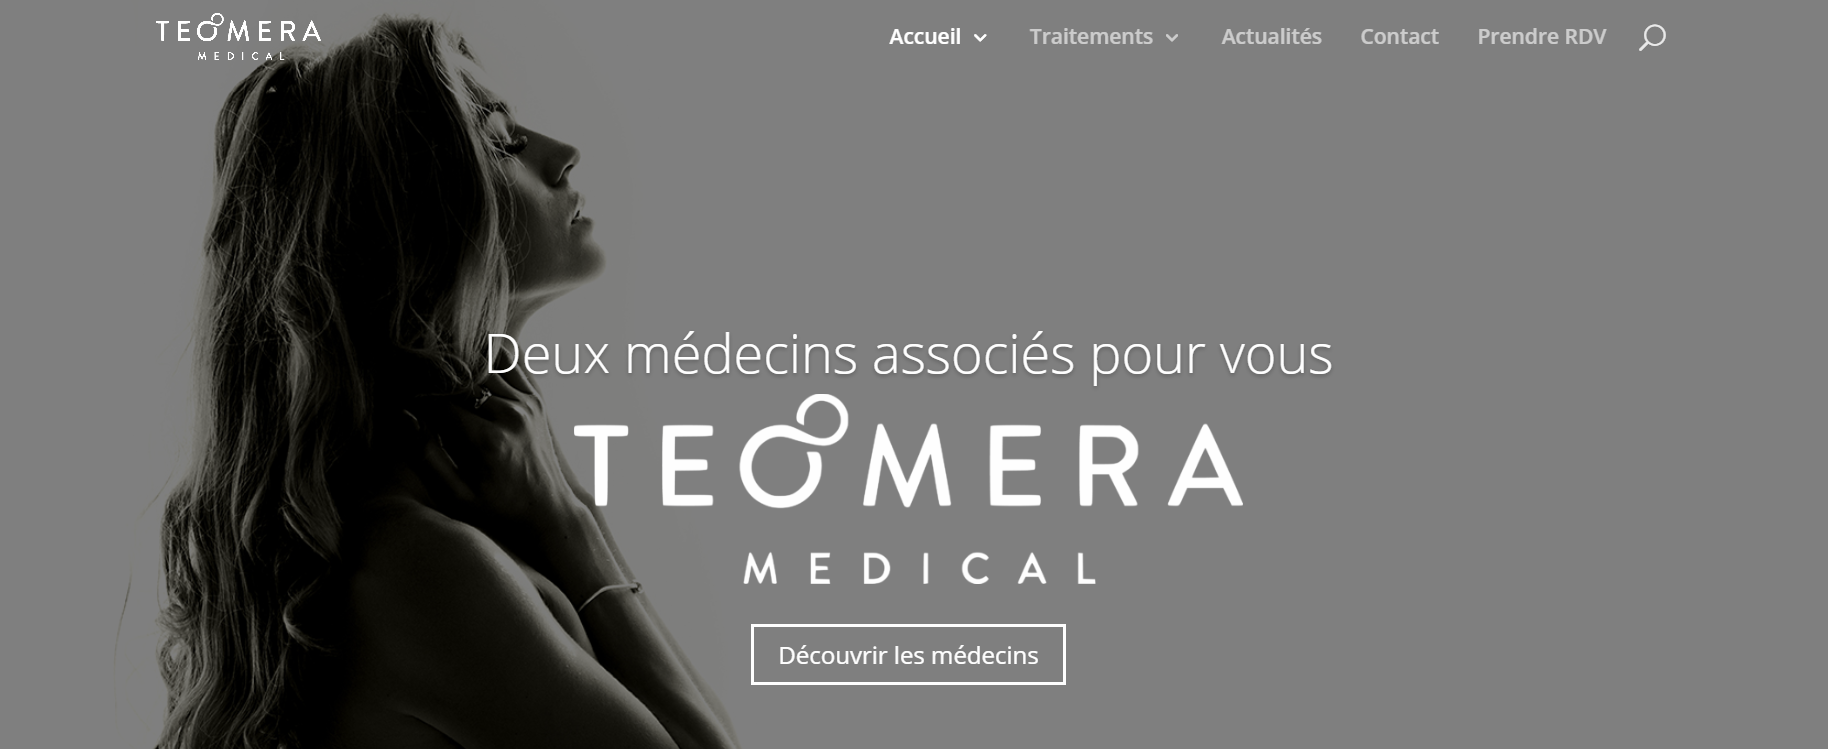 teomera médical